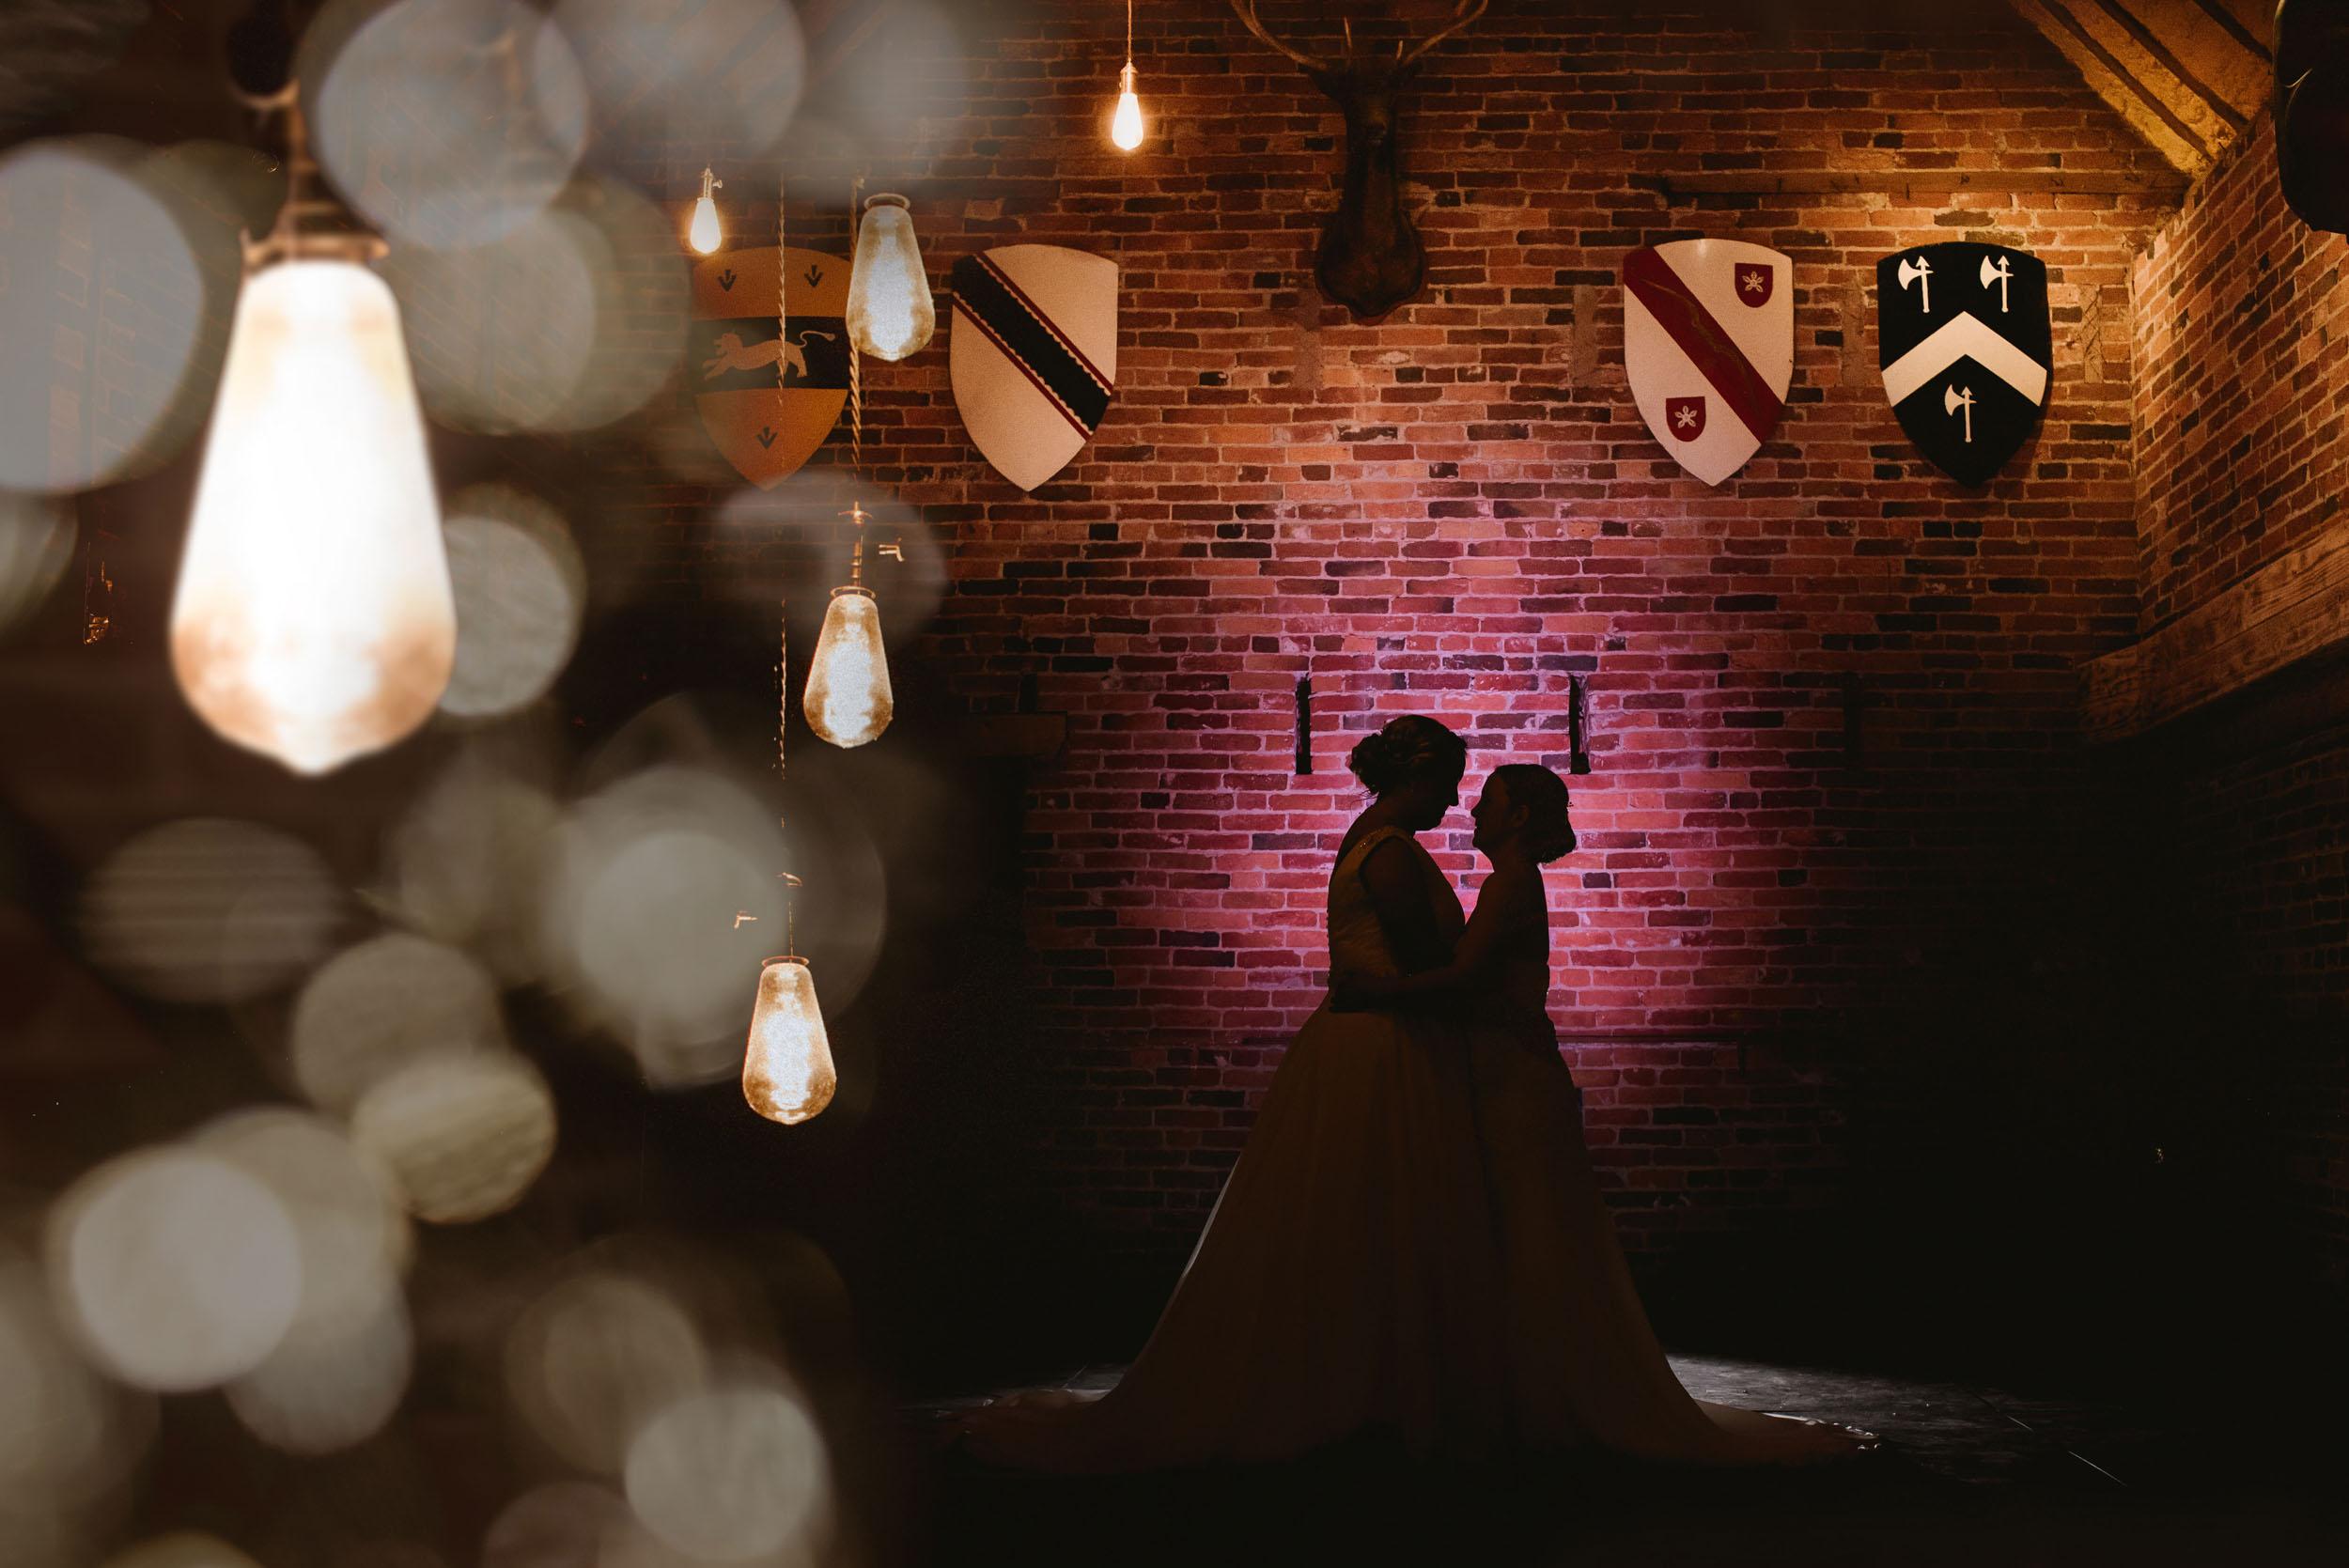 Donington-park-farm-wedding-photography-701.jpg